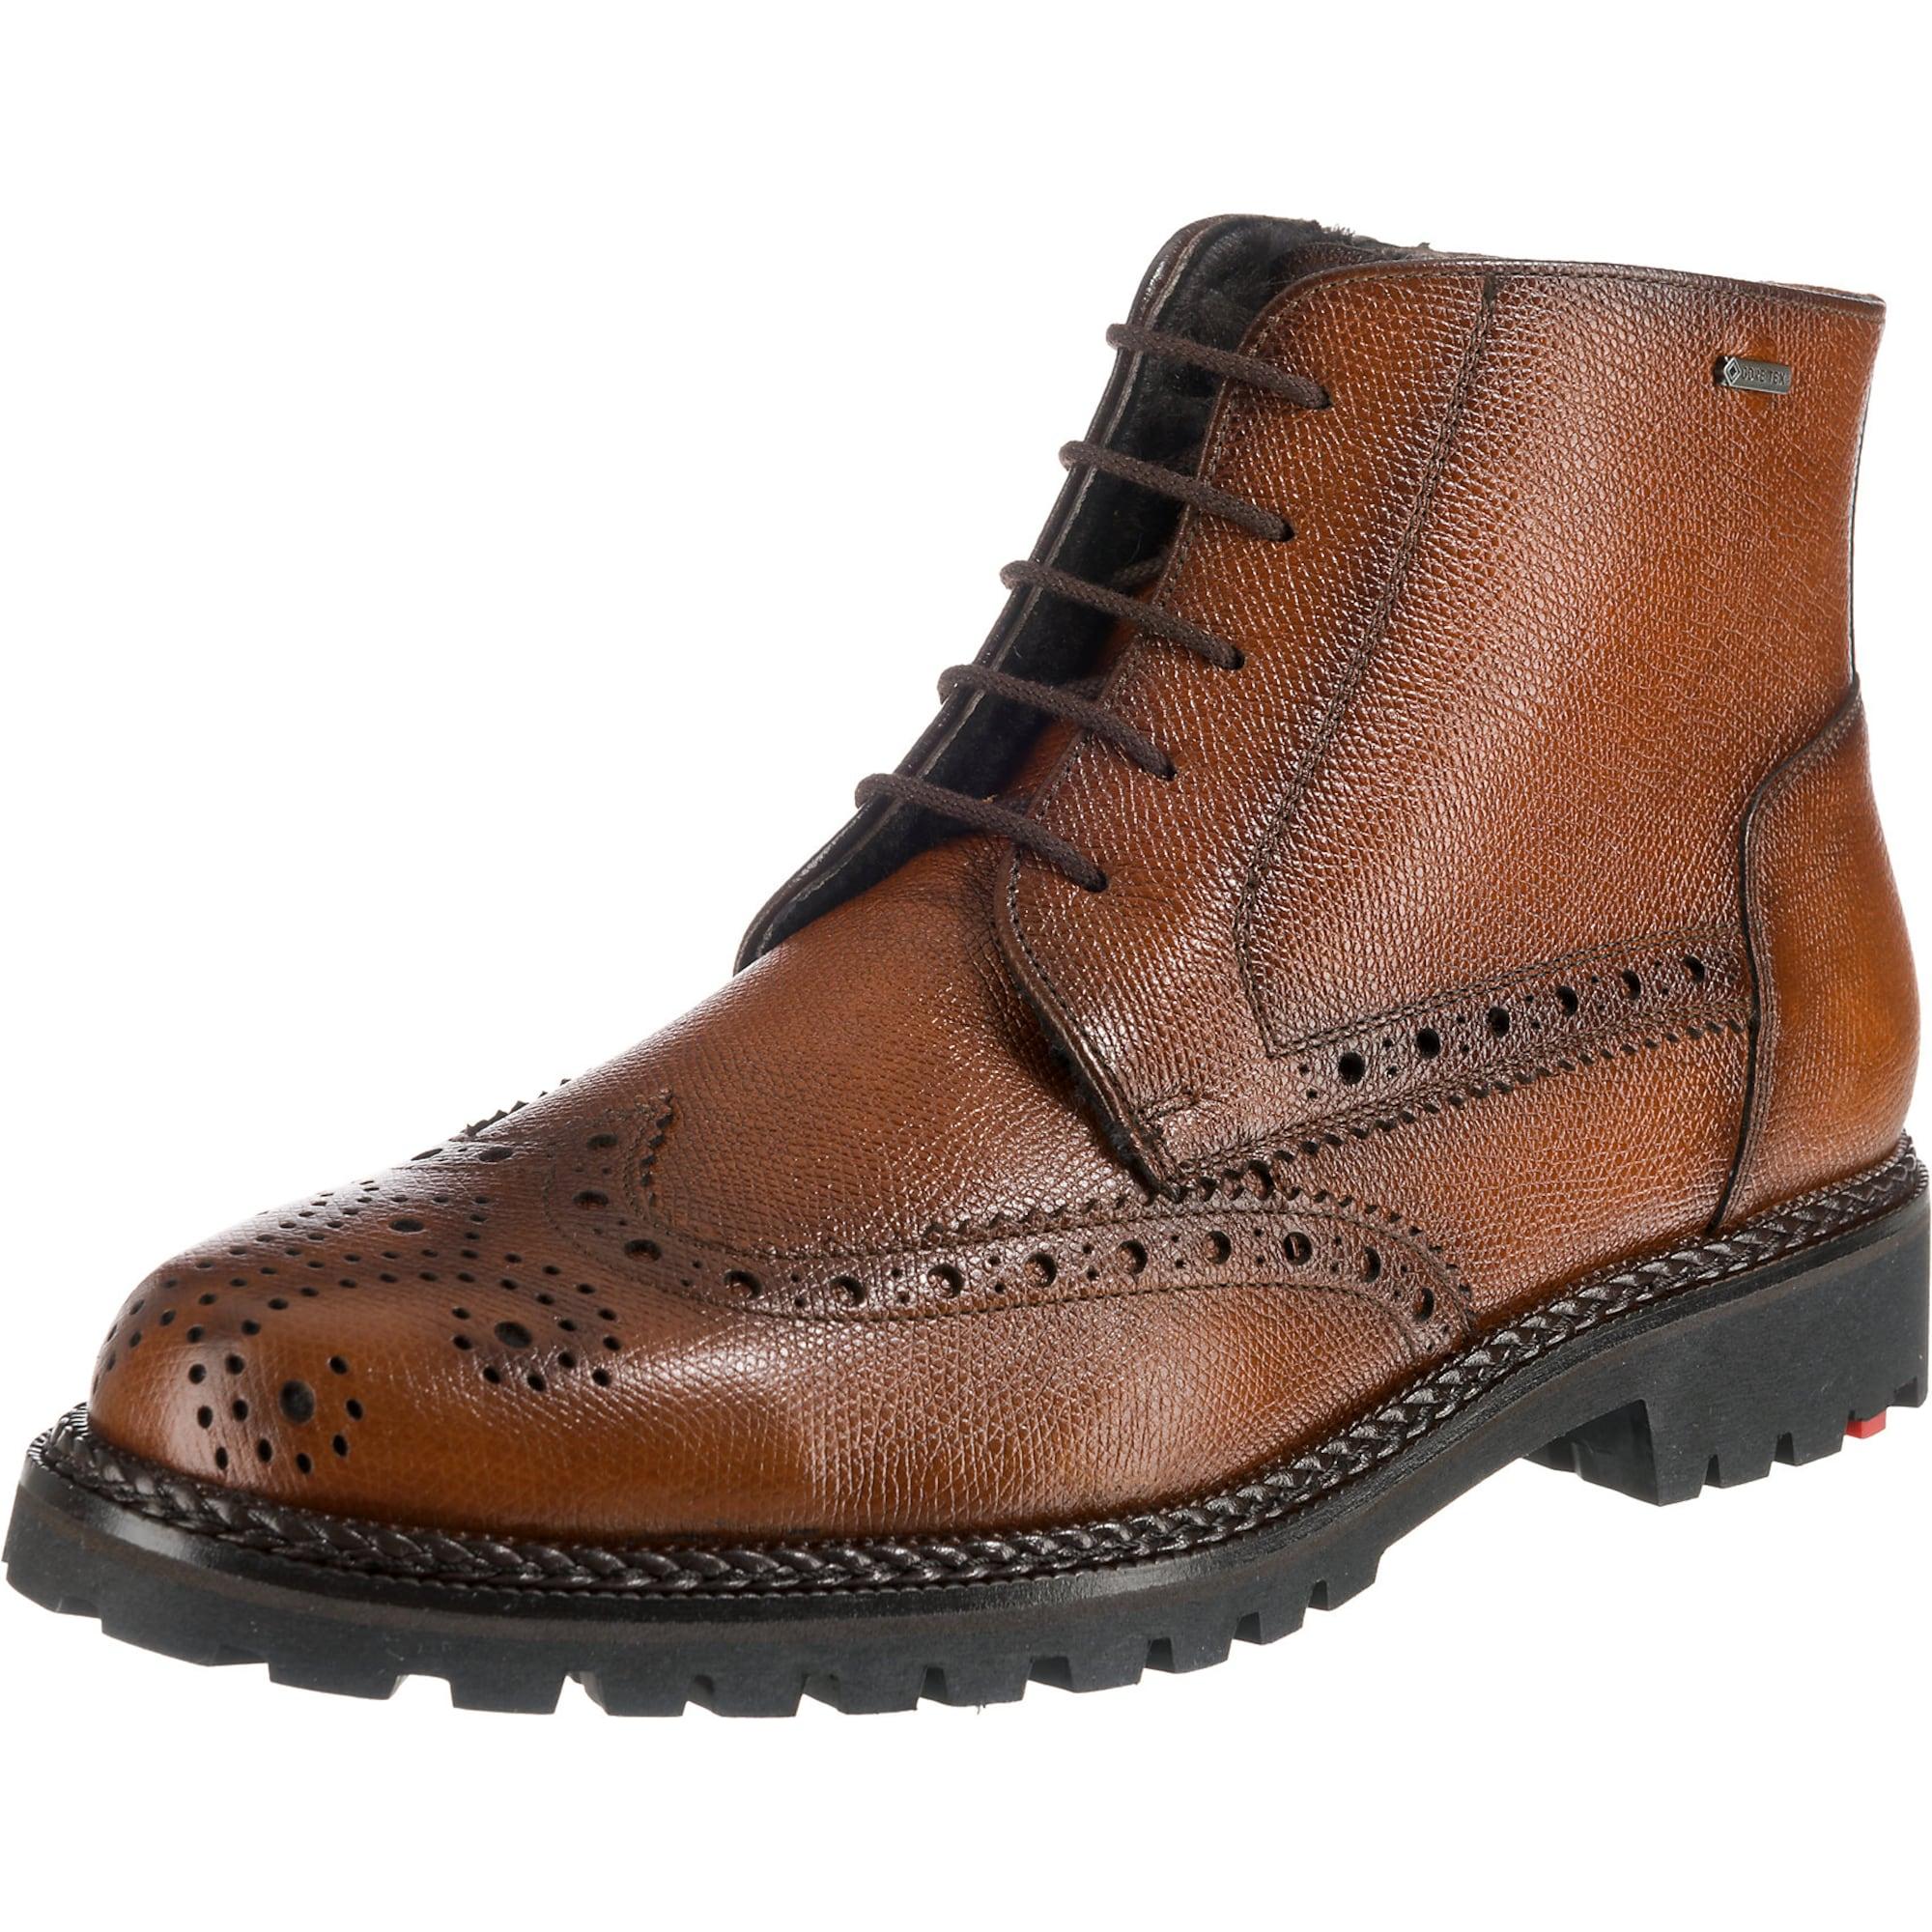 Winterstiefel 'Vanny' | Schuhe > Boots > Winterstiefel | Lloyd